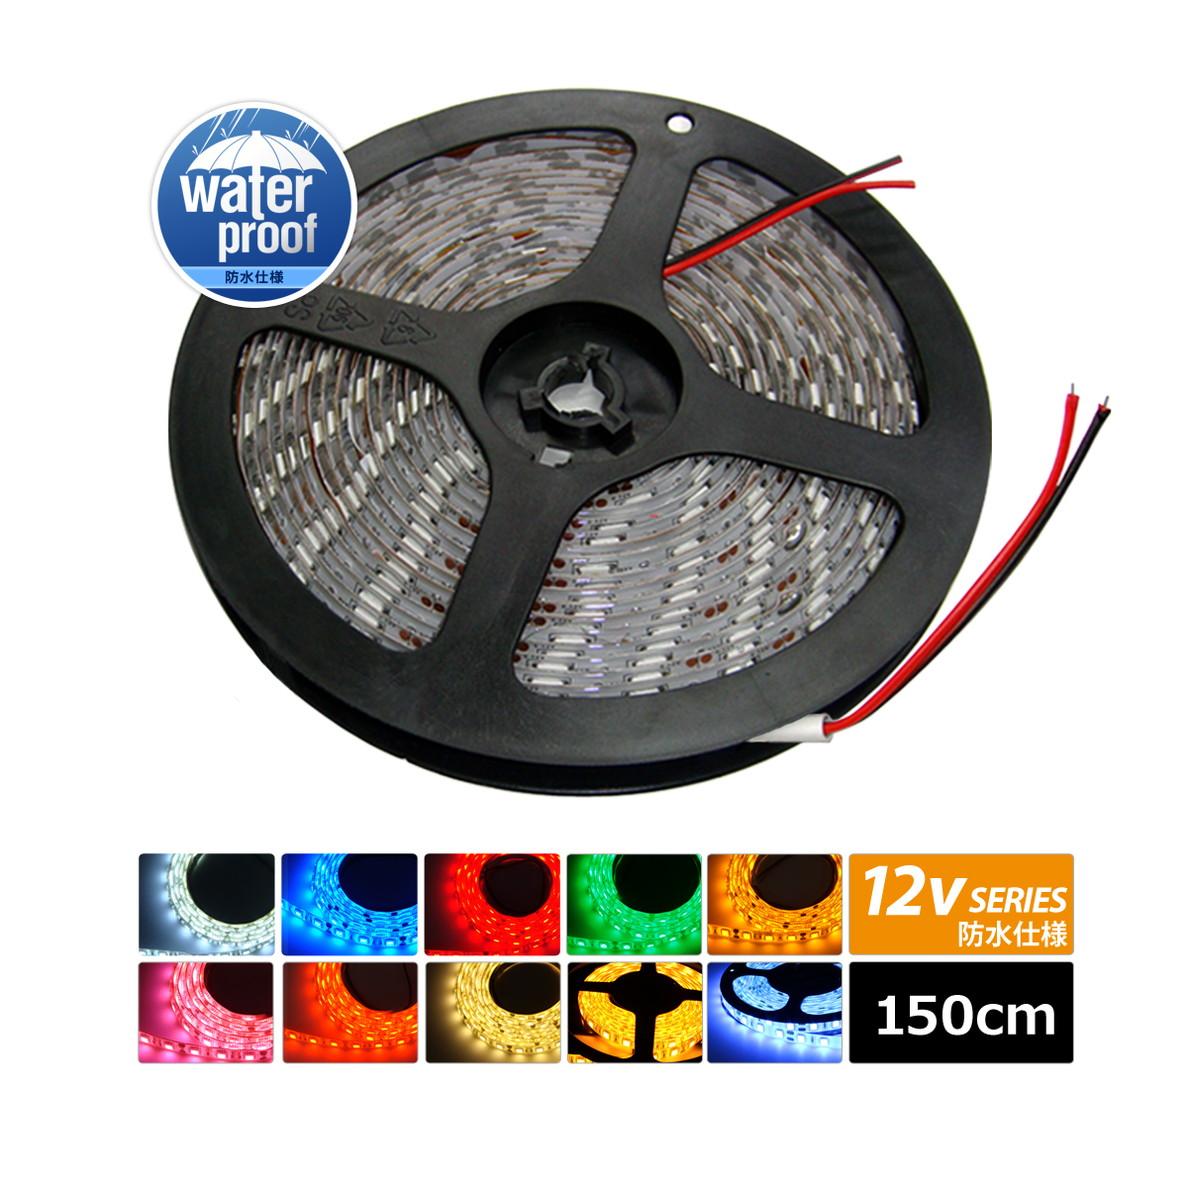 [150cm×1本] 超安12V 防水 LEDテープライト 3チップ 150cm [白ベース   ケーブル12cm]